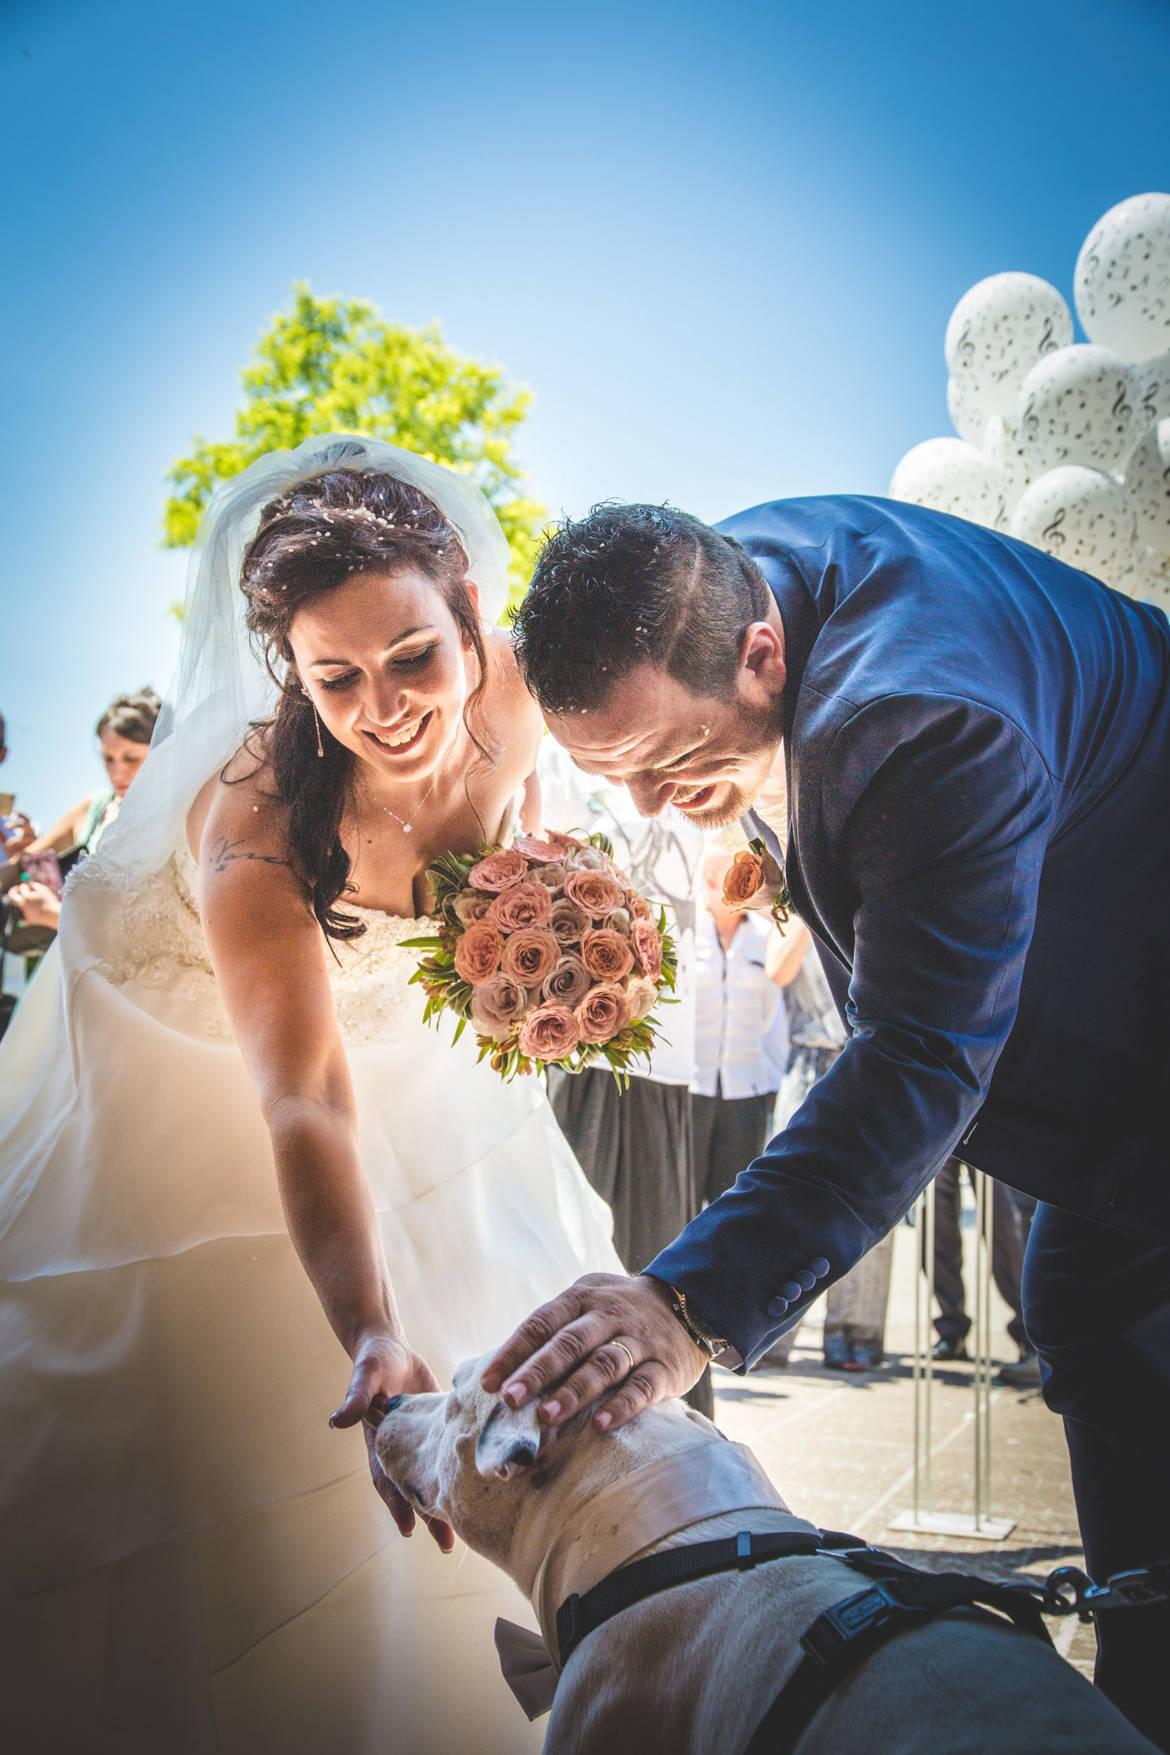 Matrimonio-Nadia-e-Tano-33.jpg